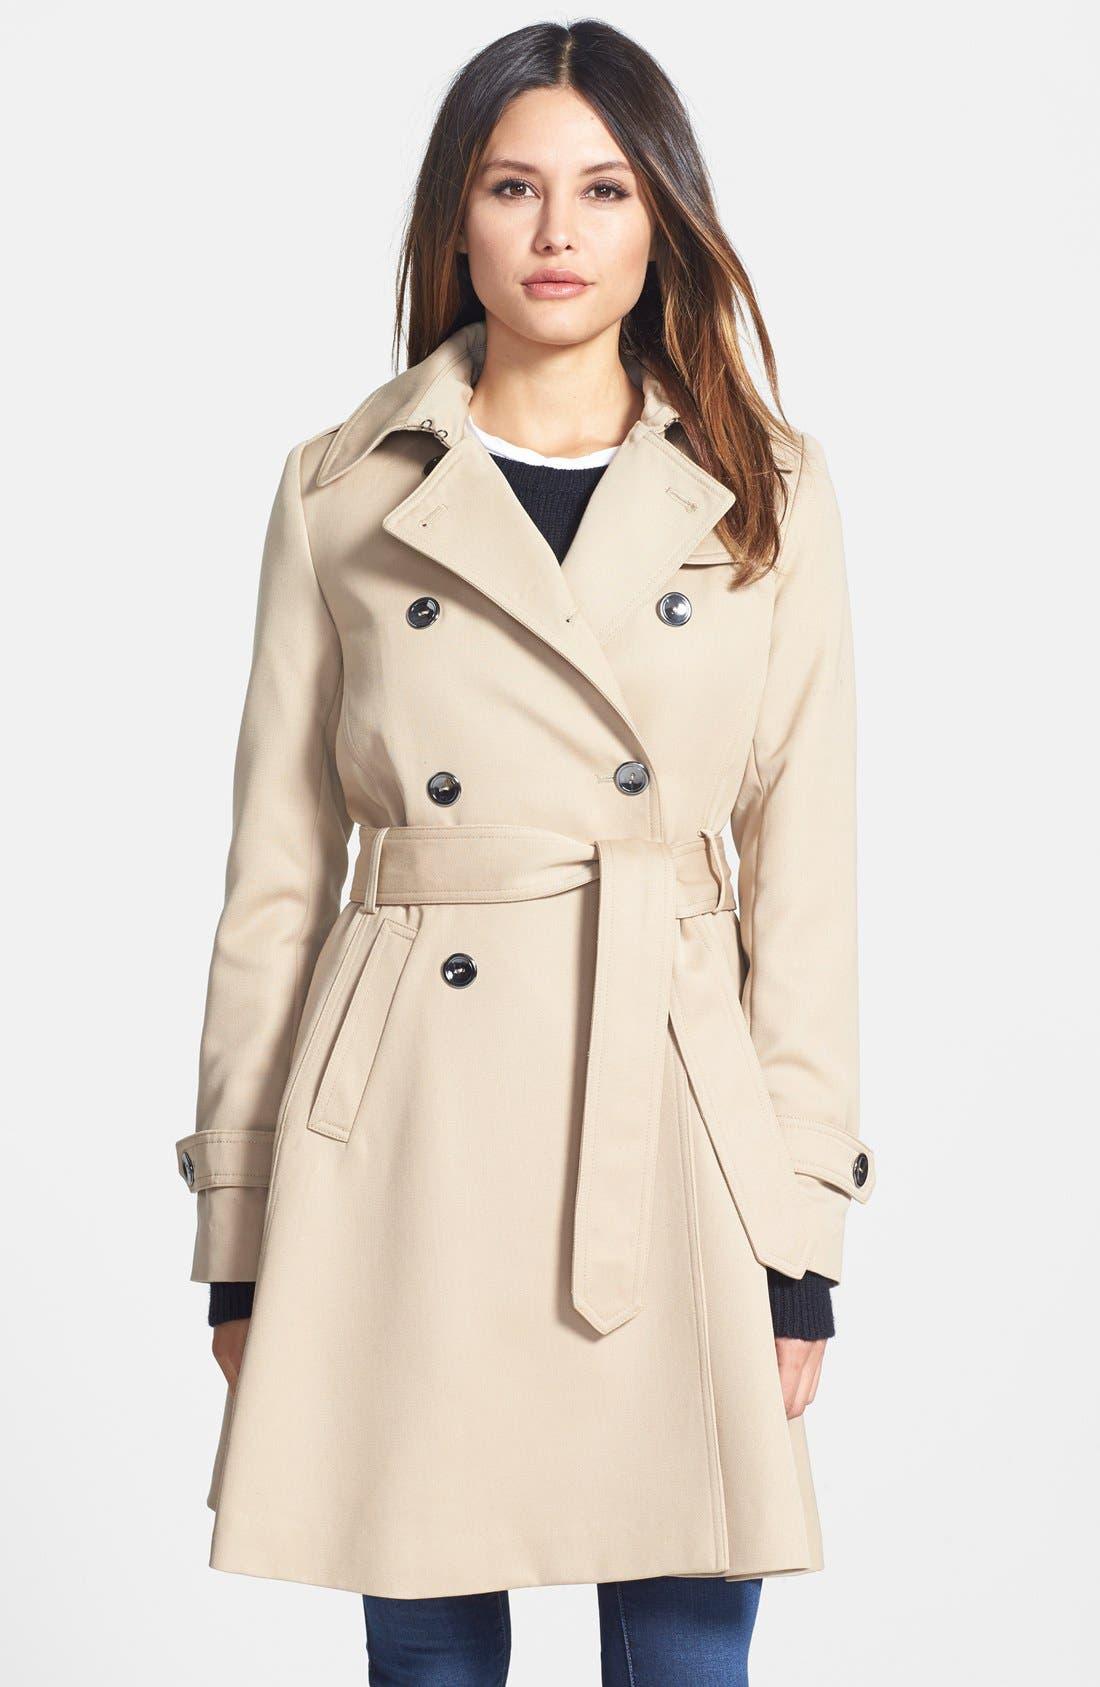 Main Image - Trina Turk 'Gwyneth' Flared Wool Gabardine Trench Coat (Regular & Petite)